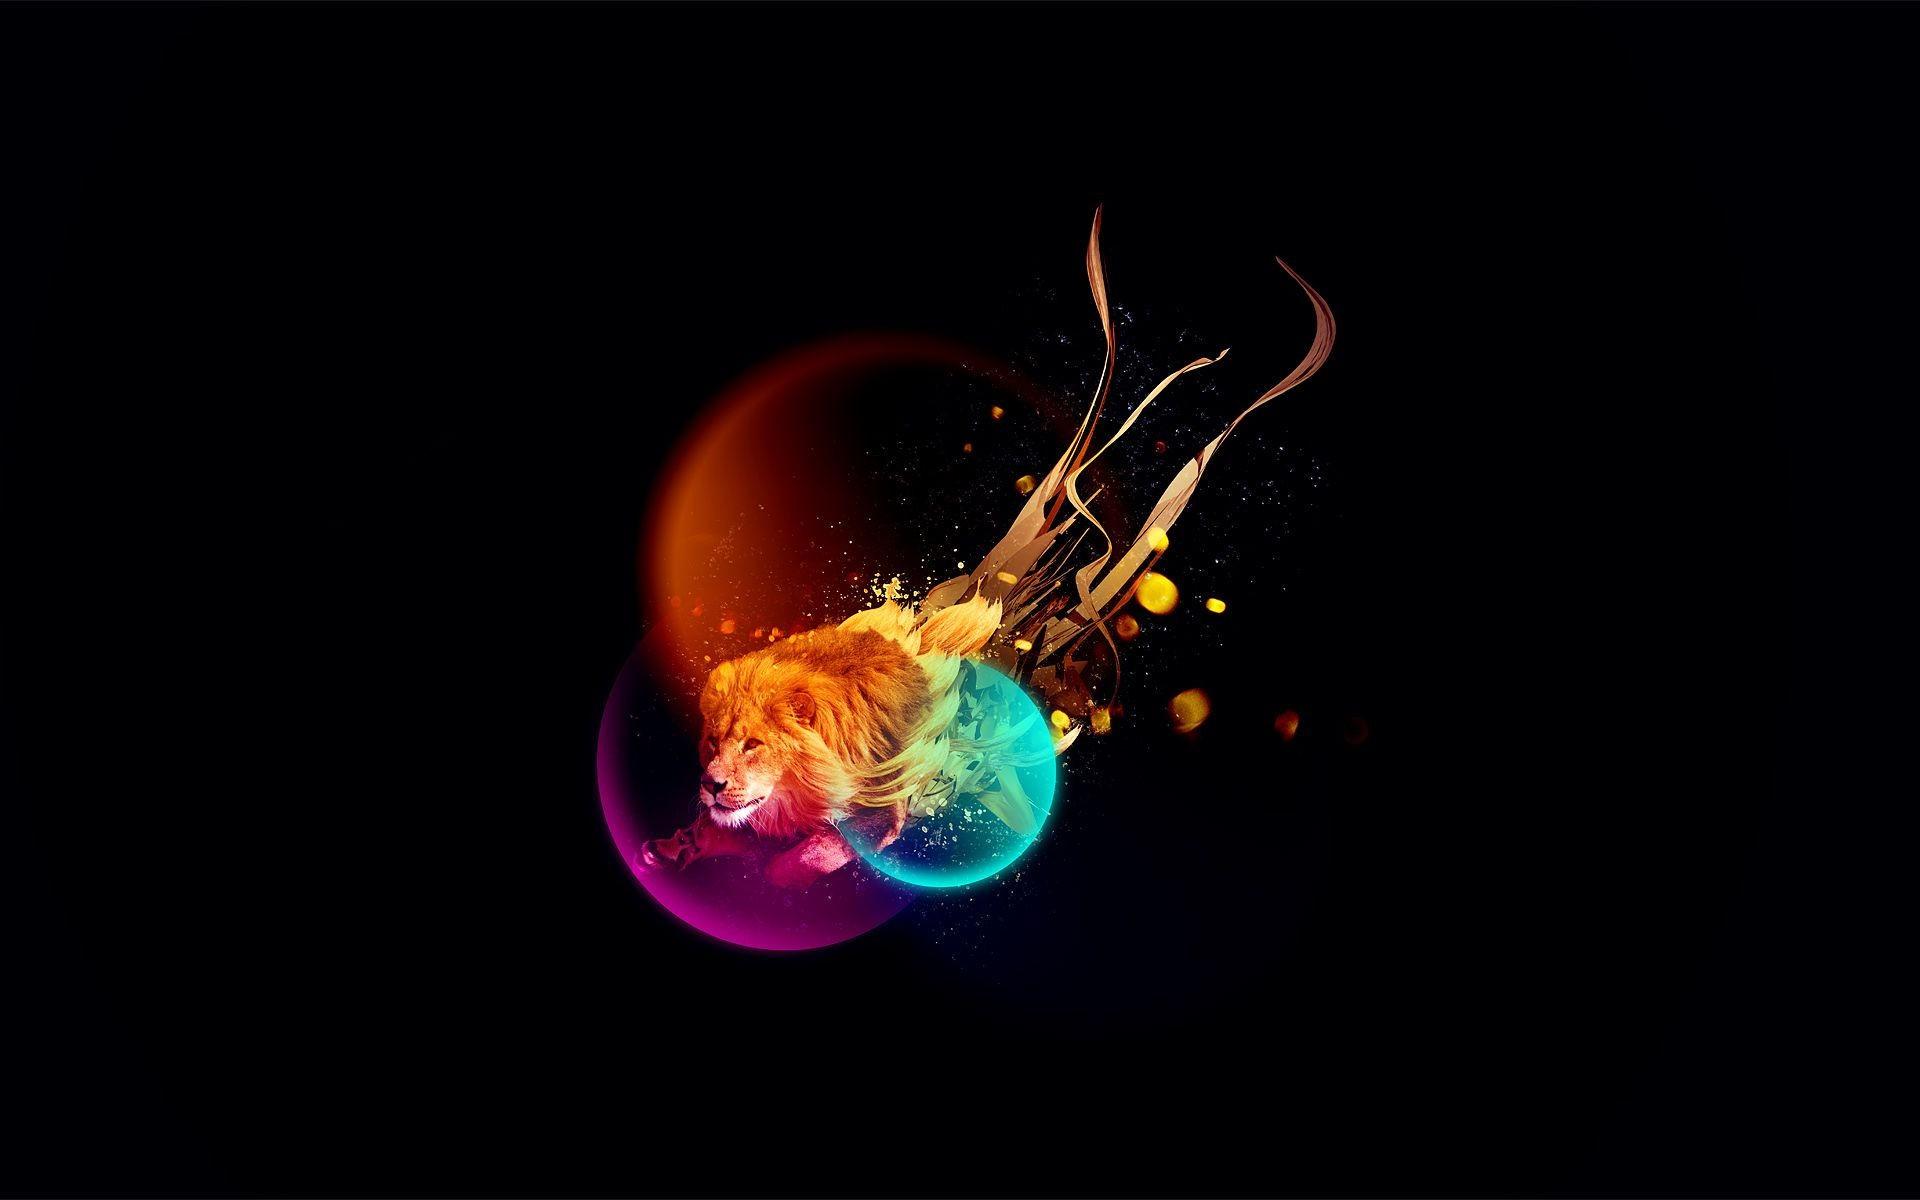 Colorful abstract lion wallpaper 30967 | ImgStocks com